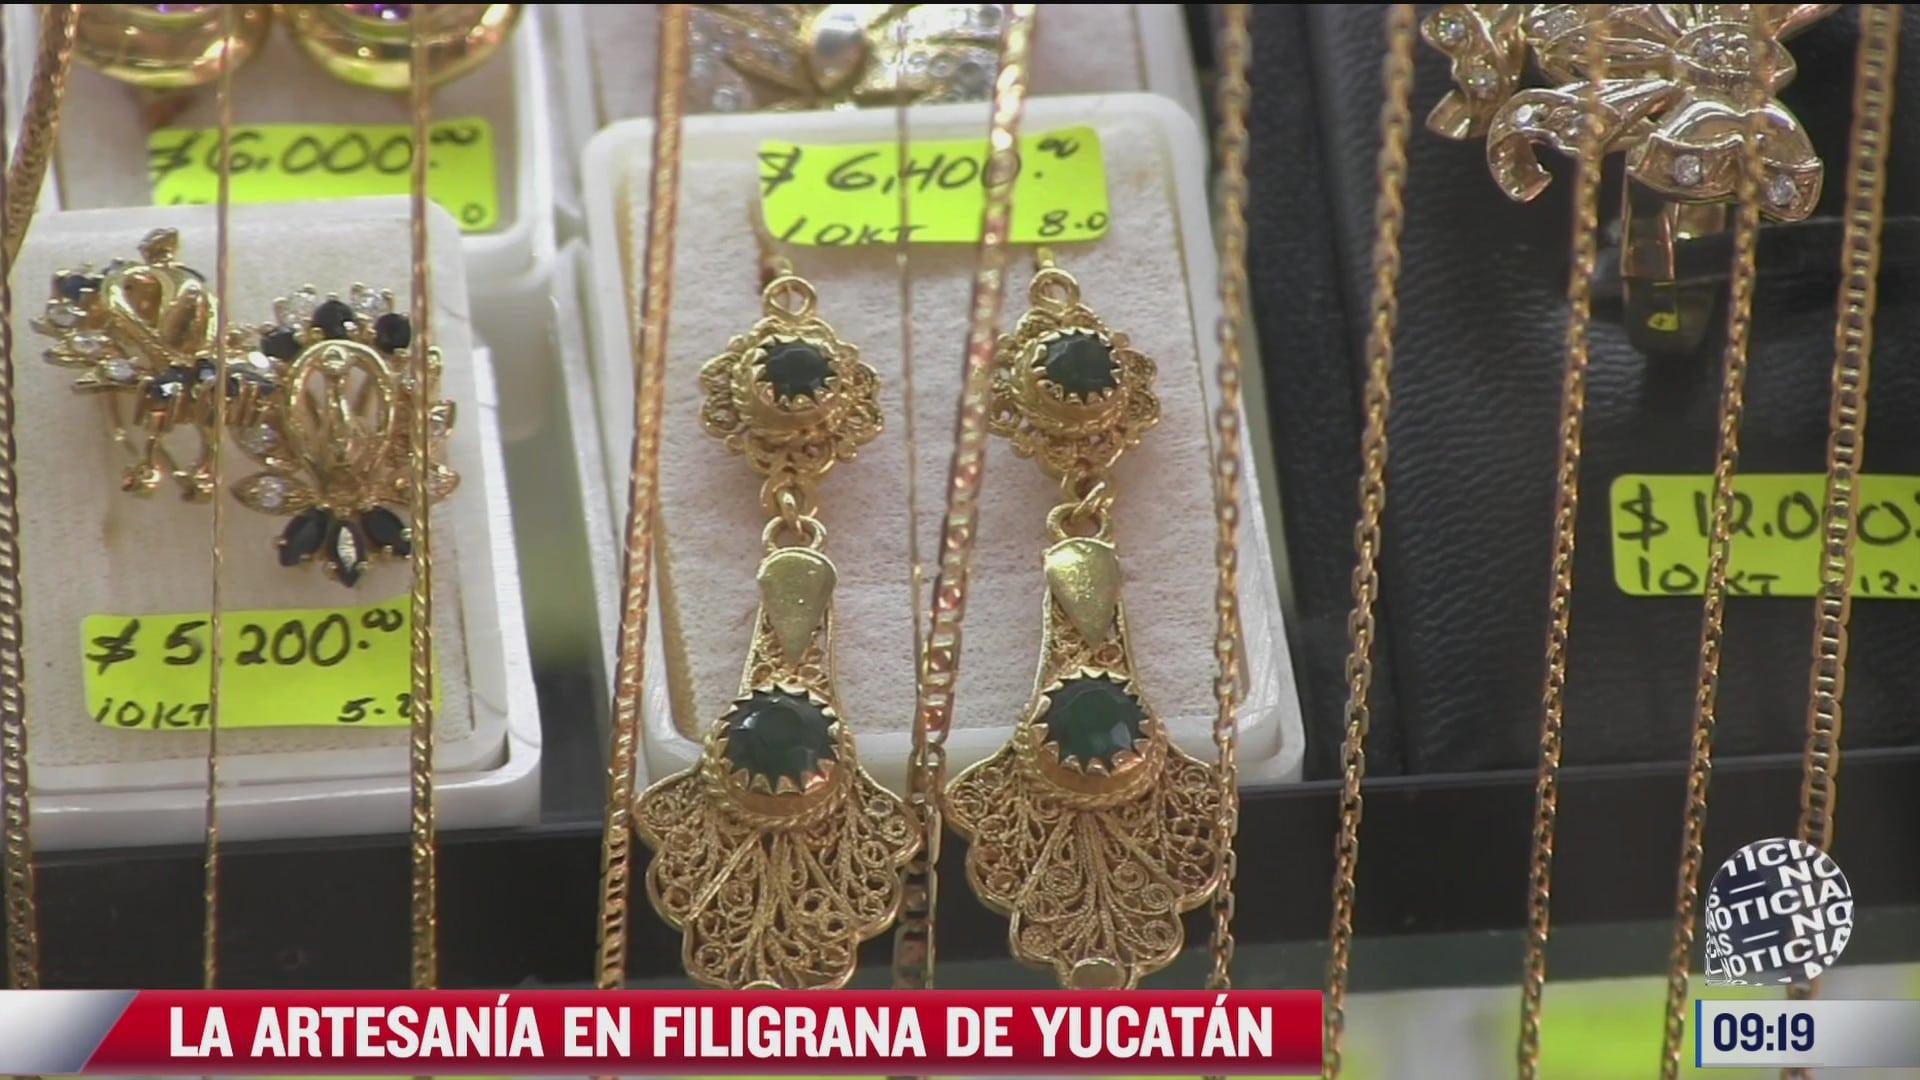 la artesania en filigrana en yucatan